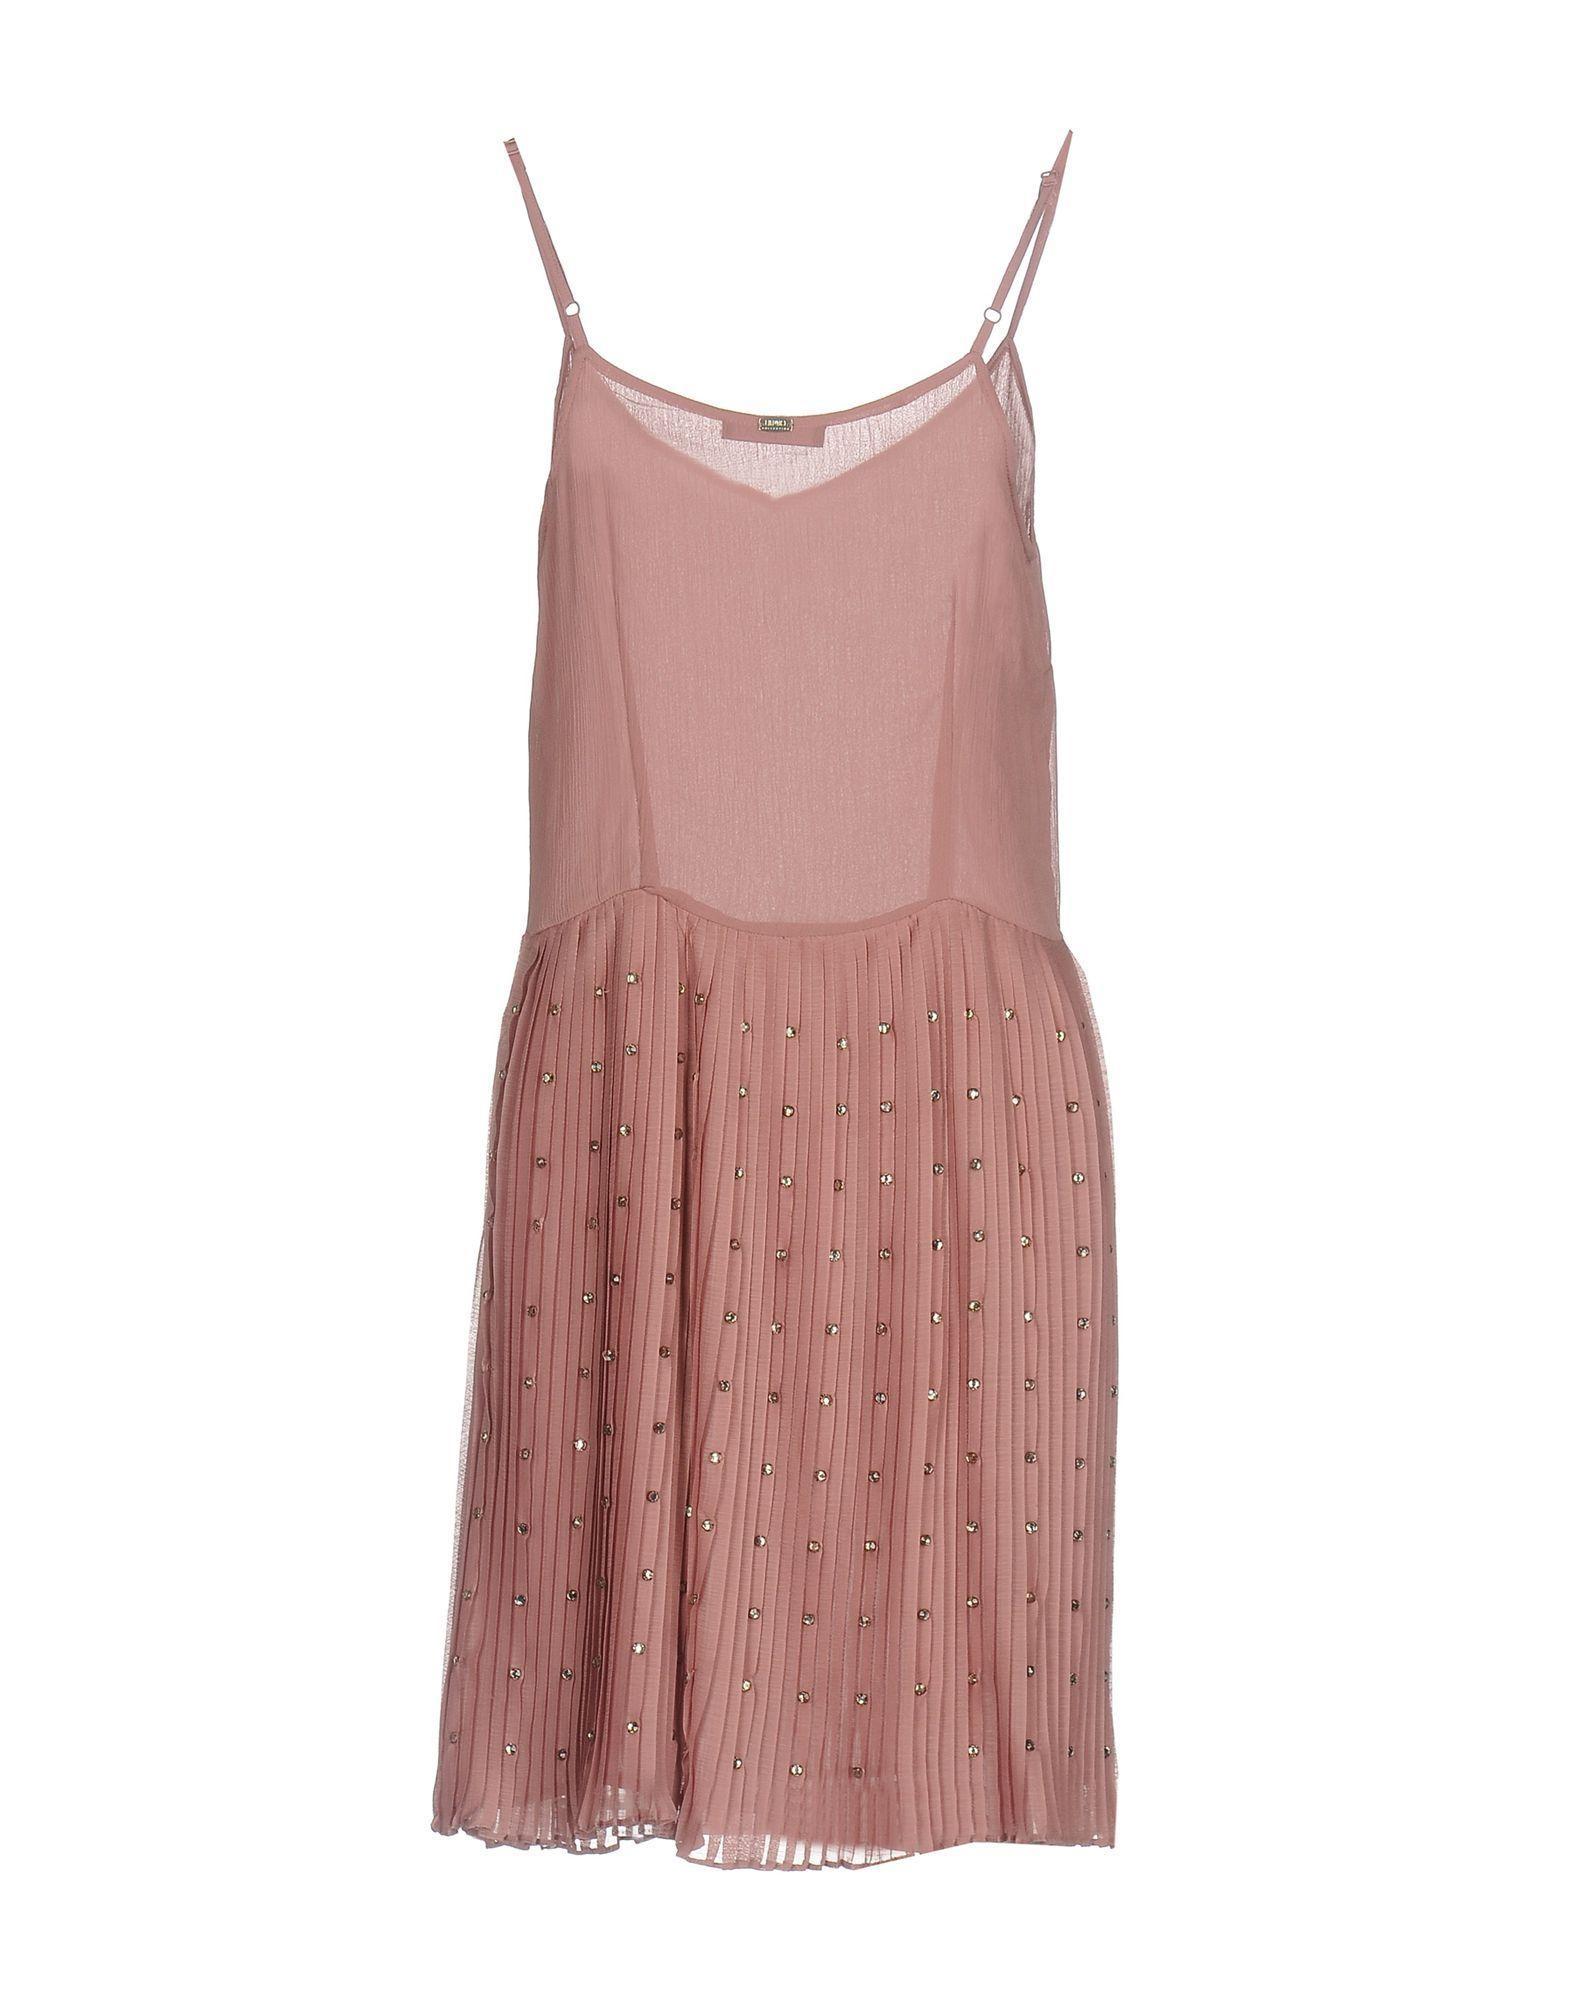 Liu Jo Pastel Pink Camisole Dress